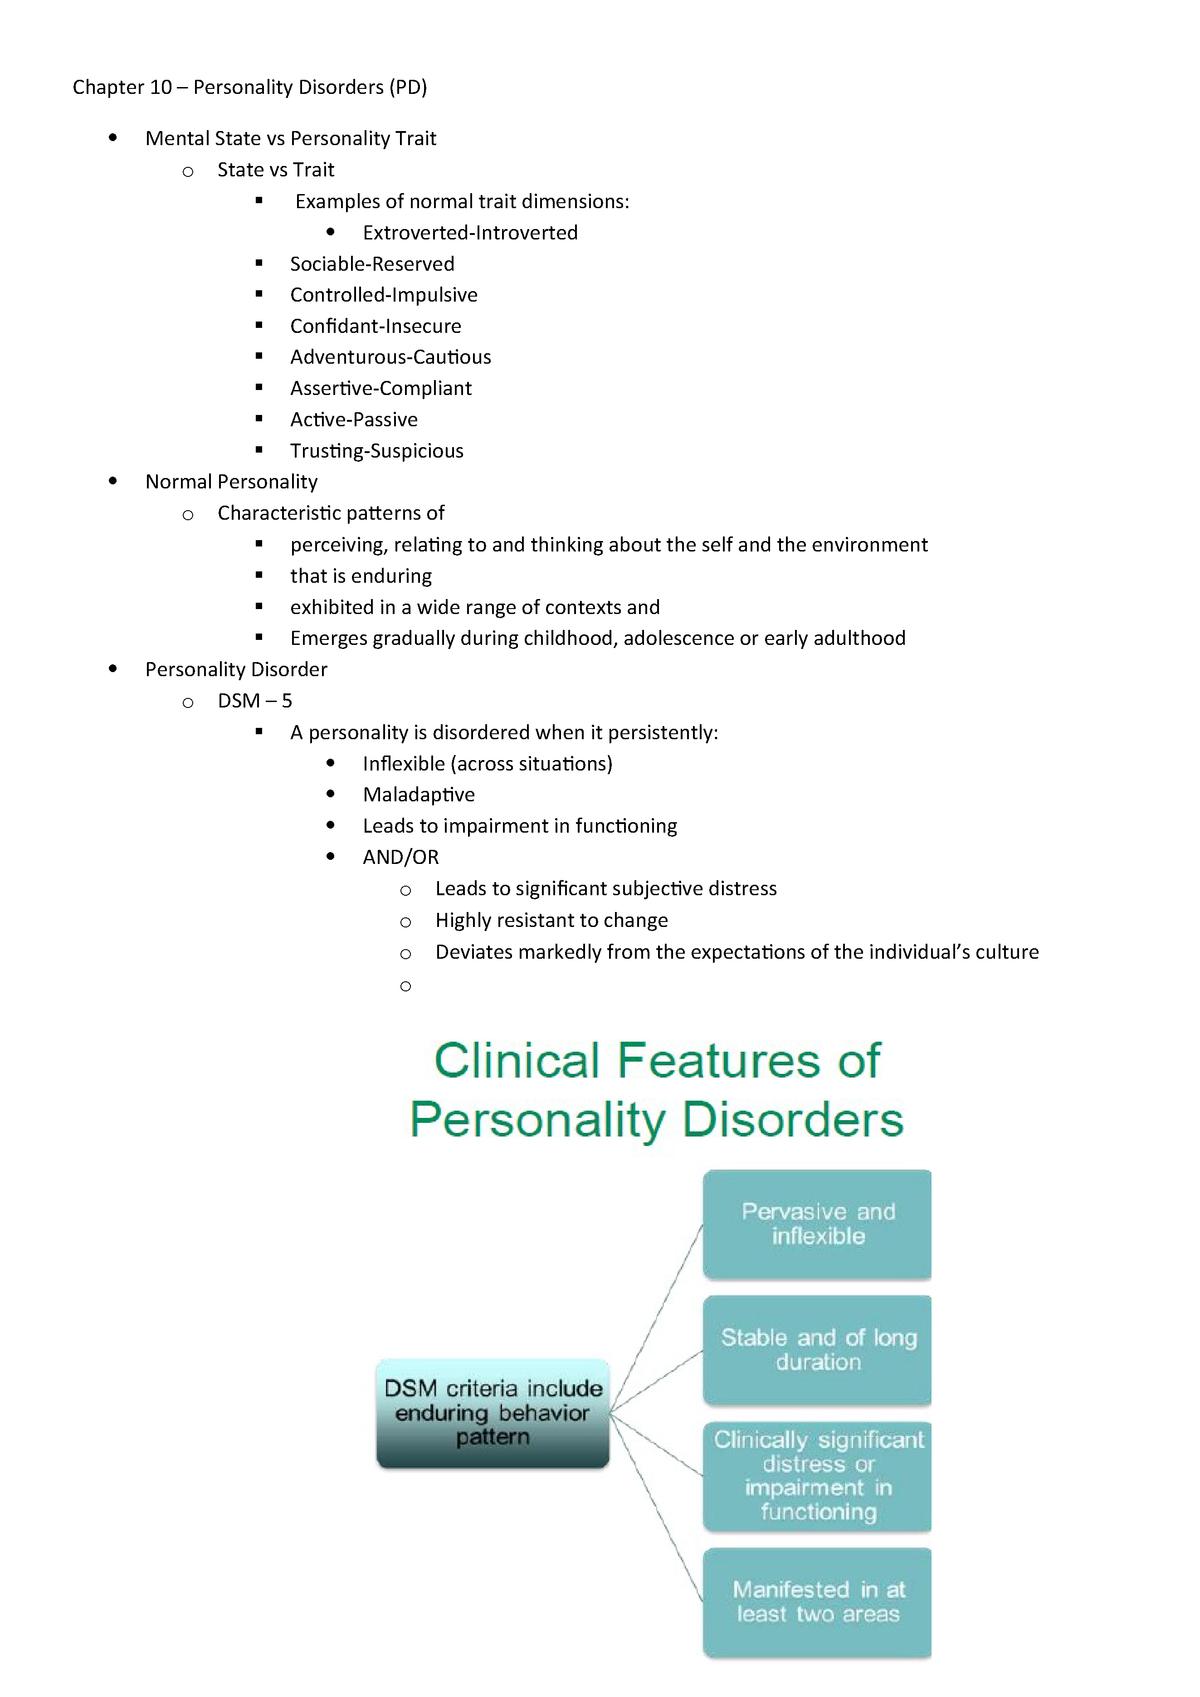 Chapter 10 - personality disorders - Psychopathology SPV212